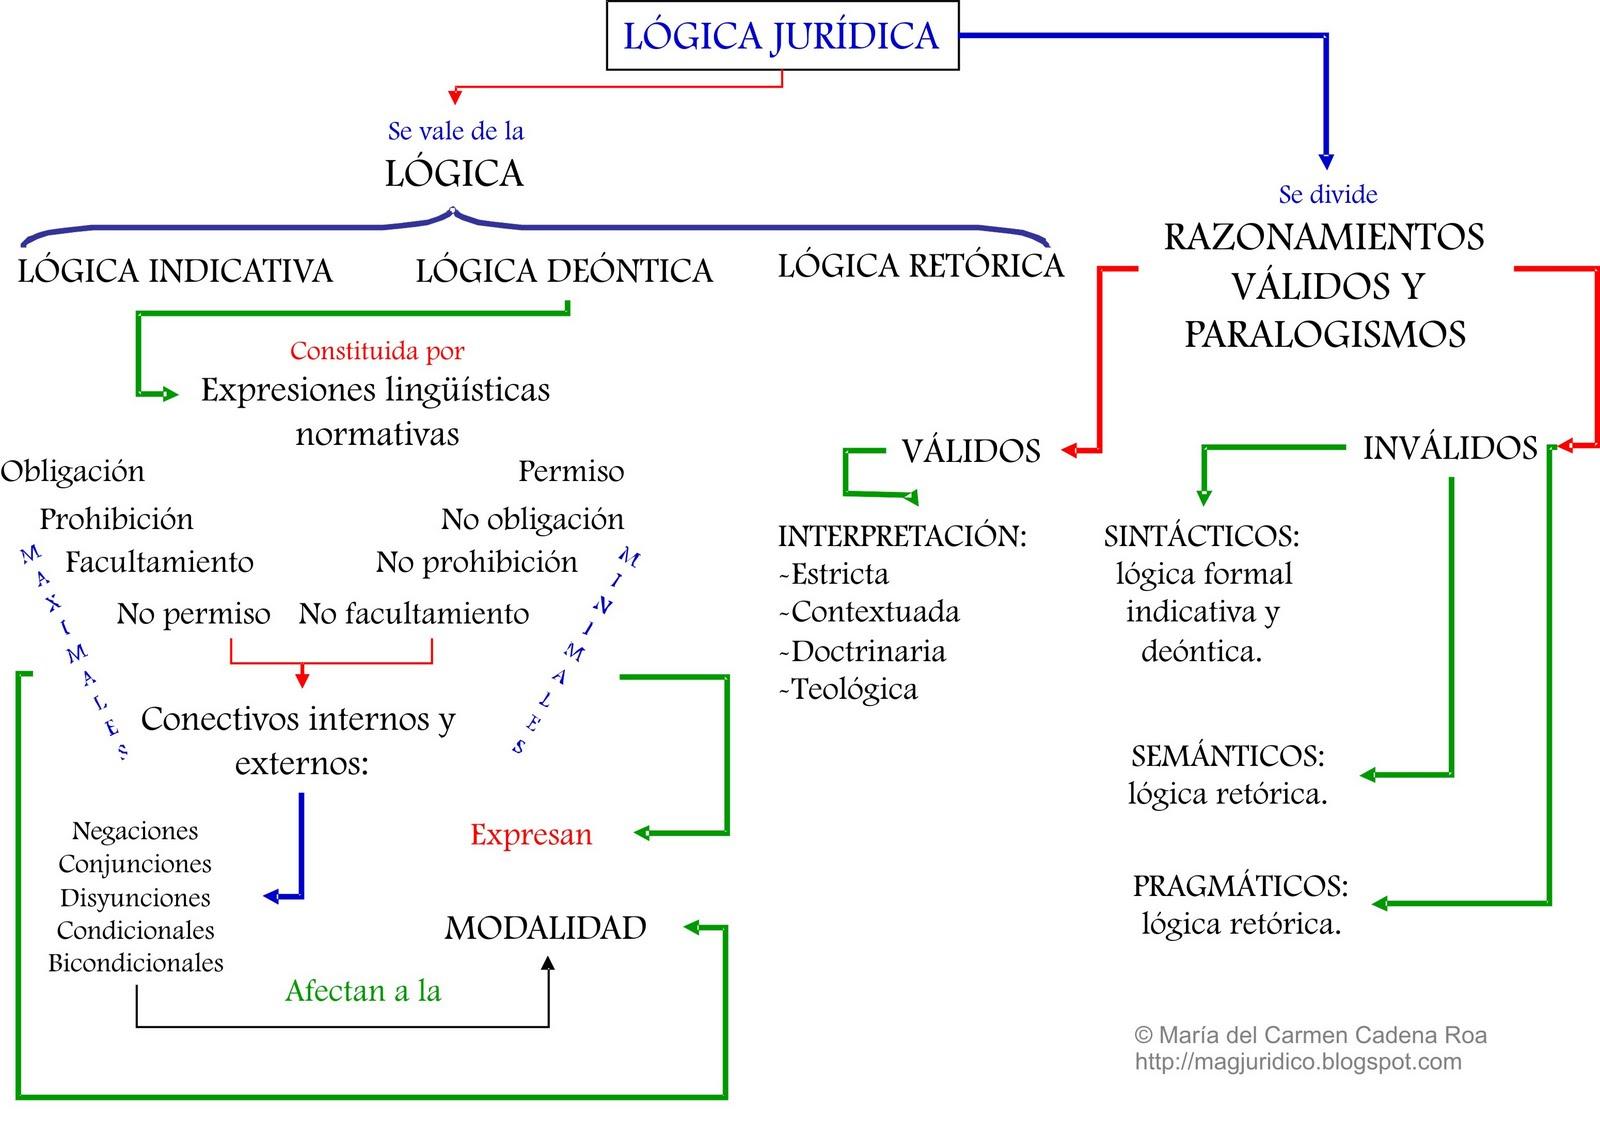 Guias De Filosofia Y Religion